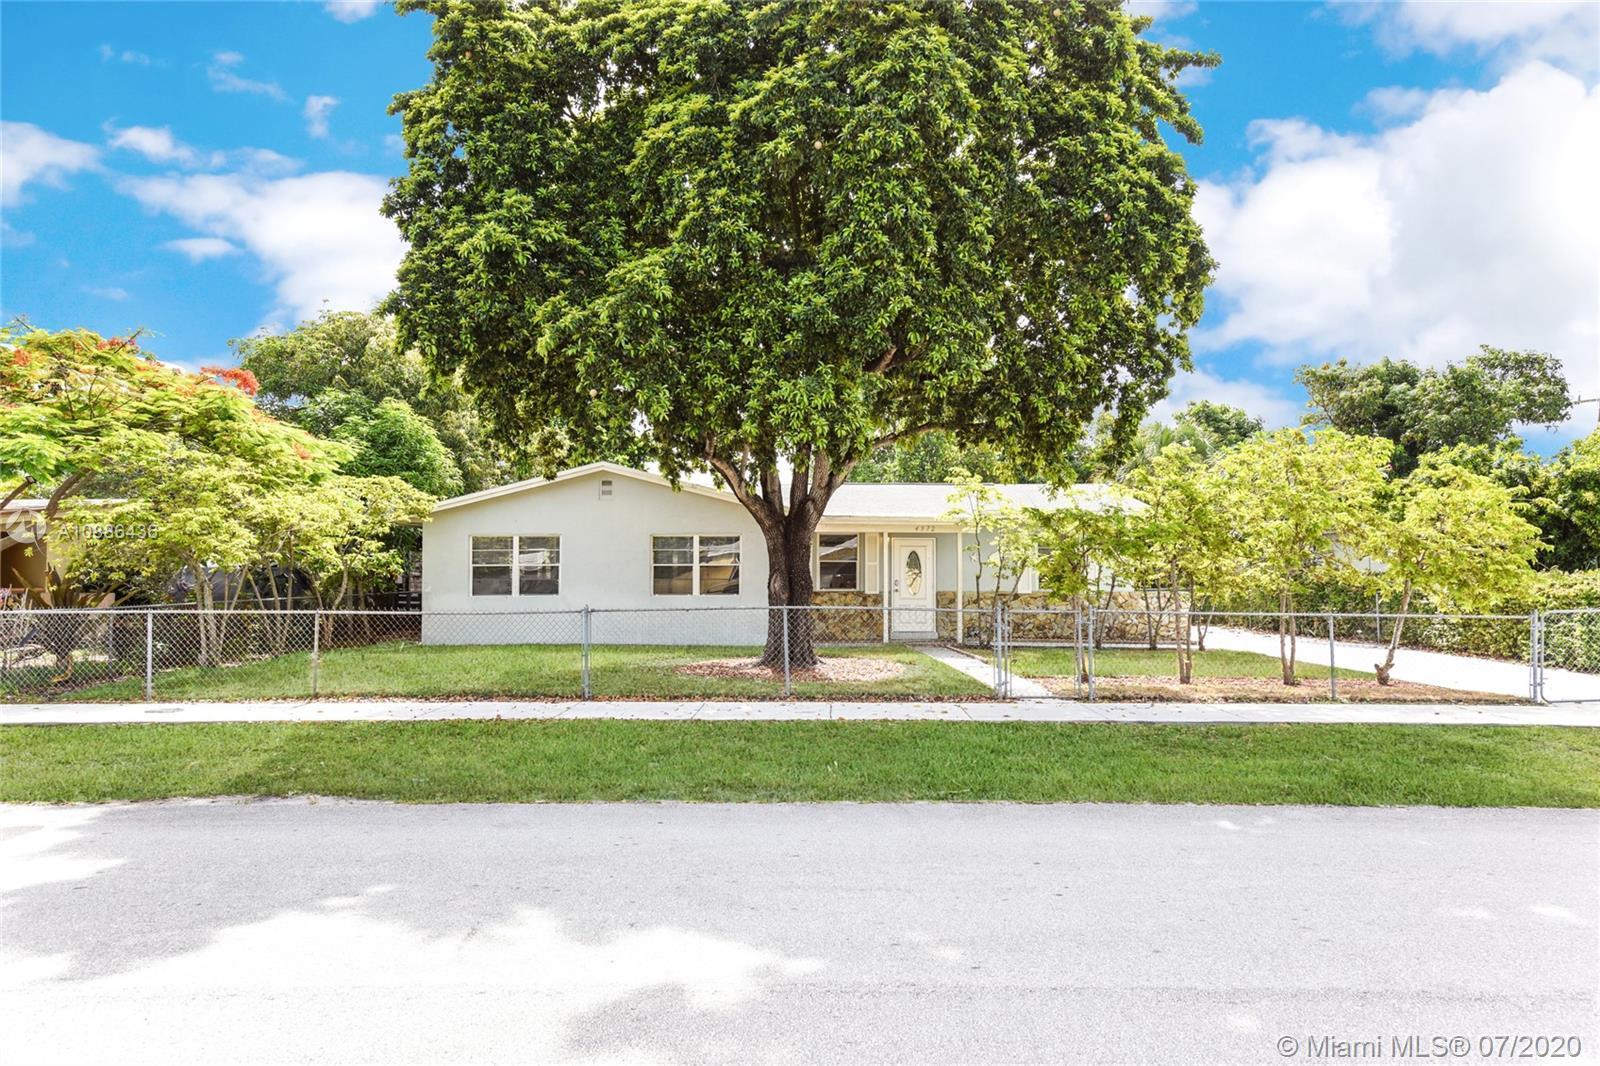 4972 NE 19th Ter Property Photo - Pompano Beach, FL real estate listing